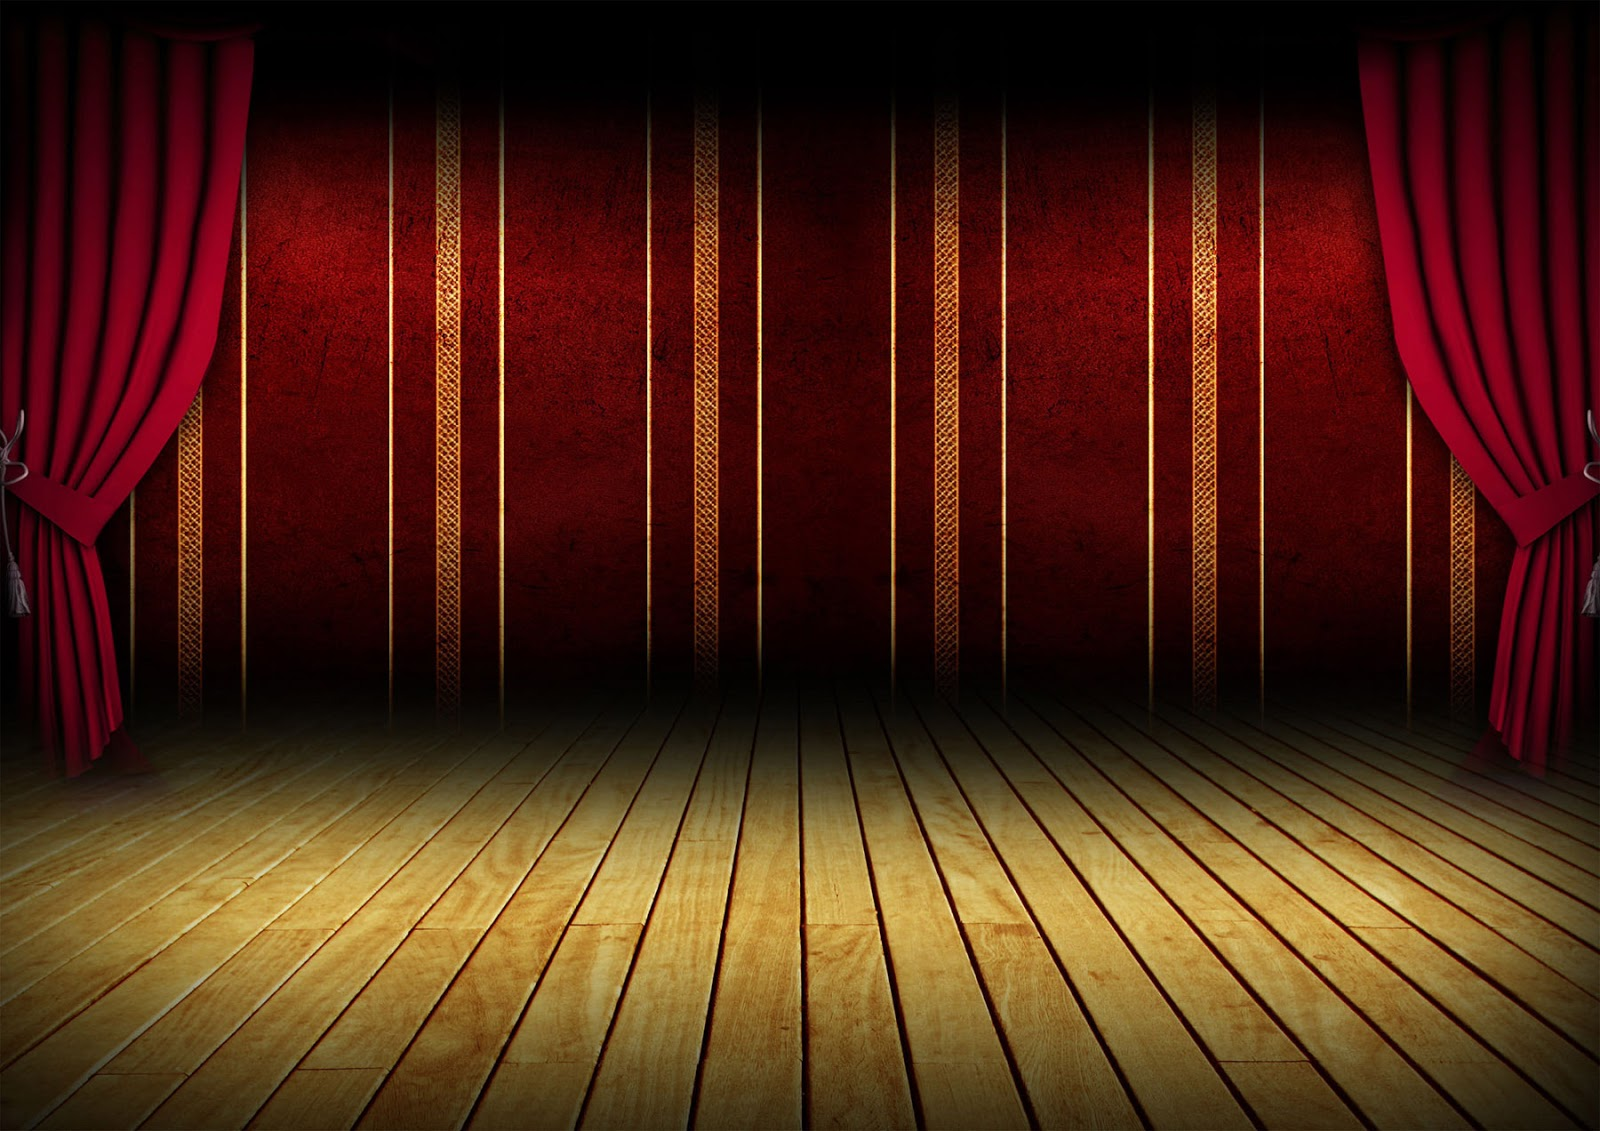 WEB-1080p | مكتبة مسرحيات ج1 -- Seeders: 2 -- Leechers: 2